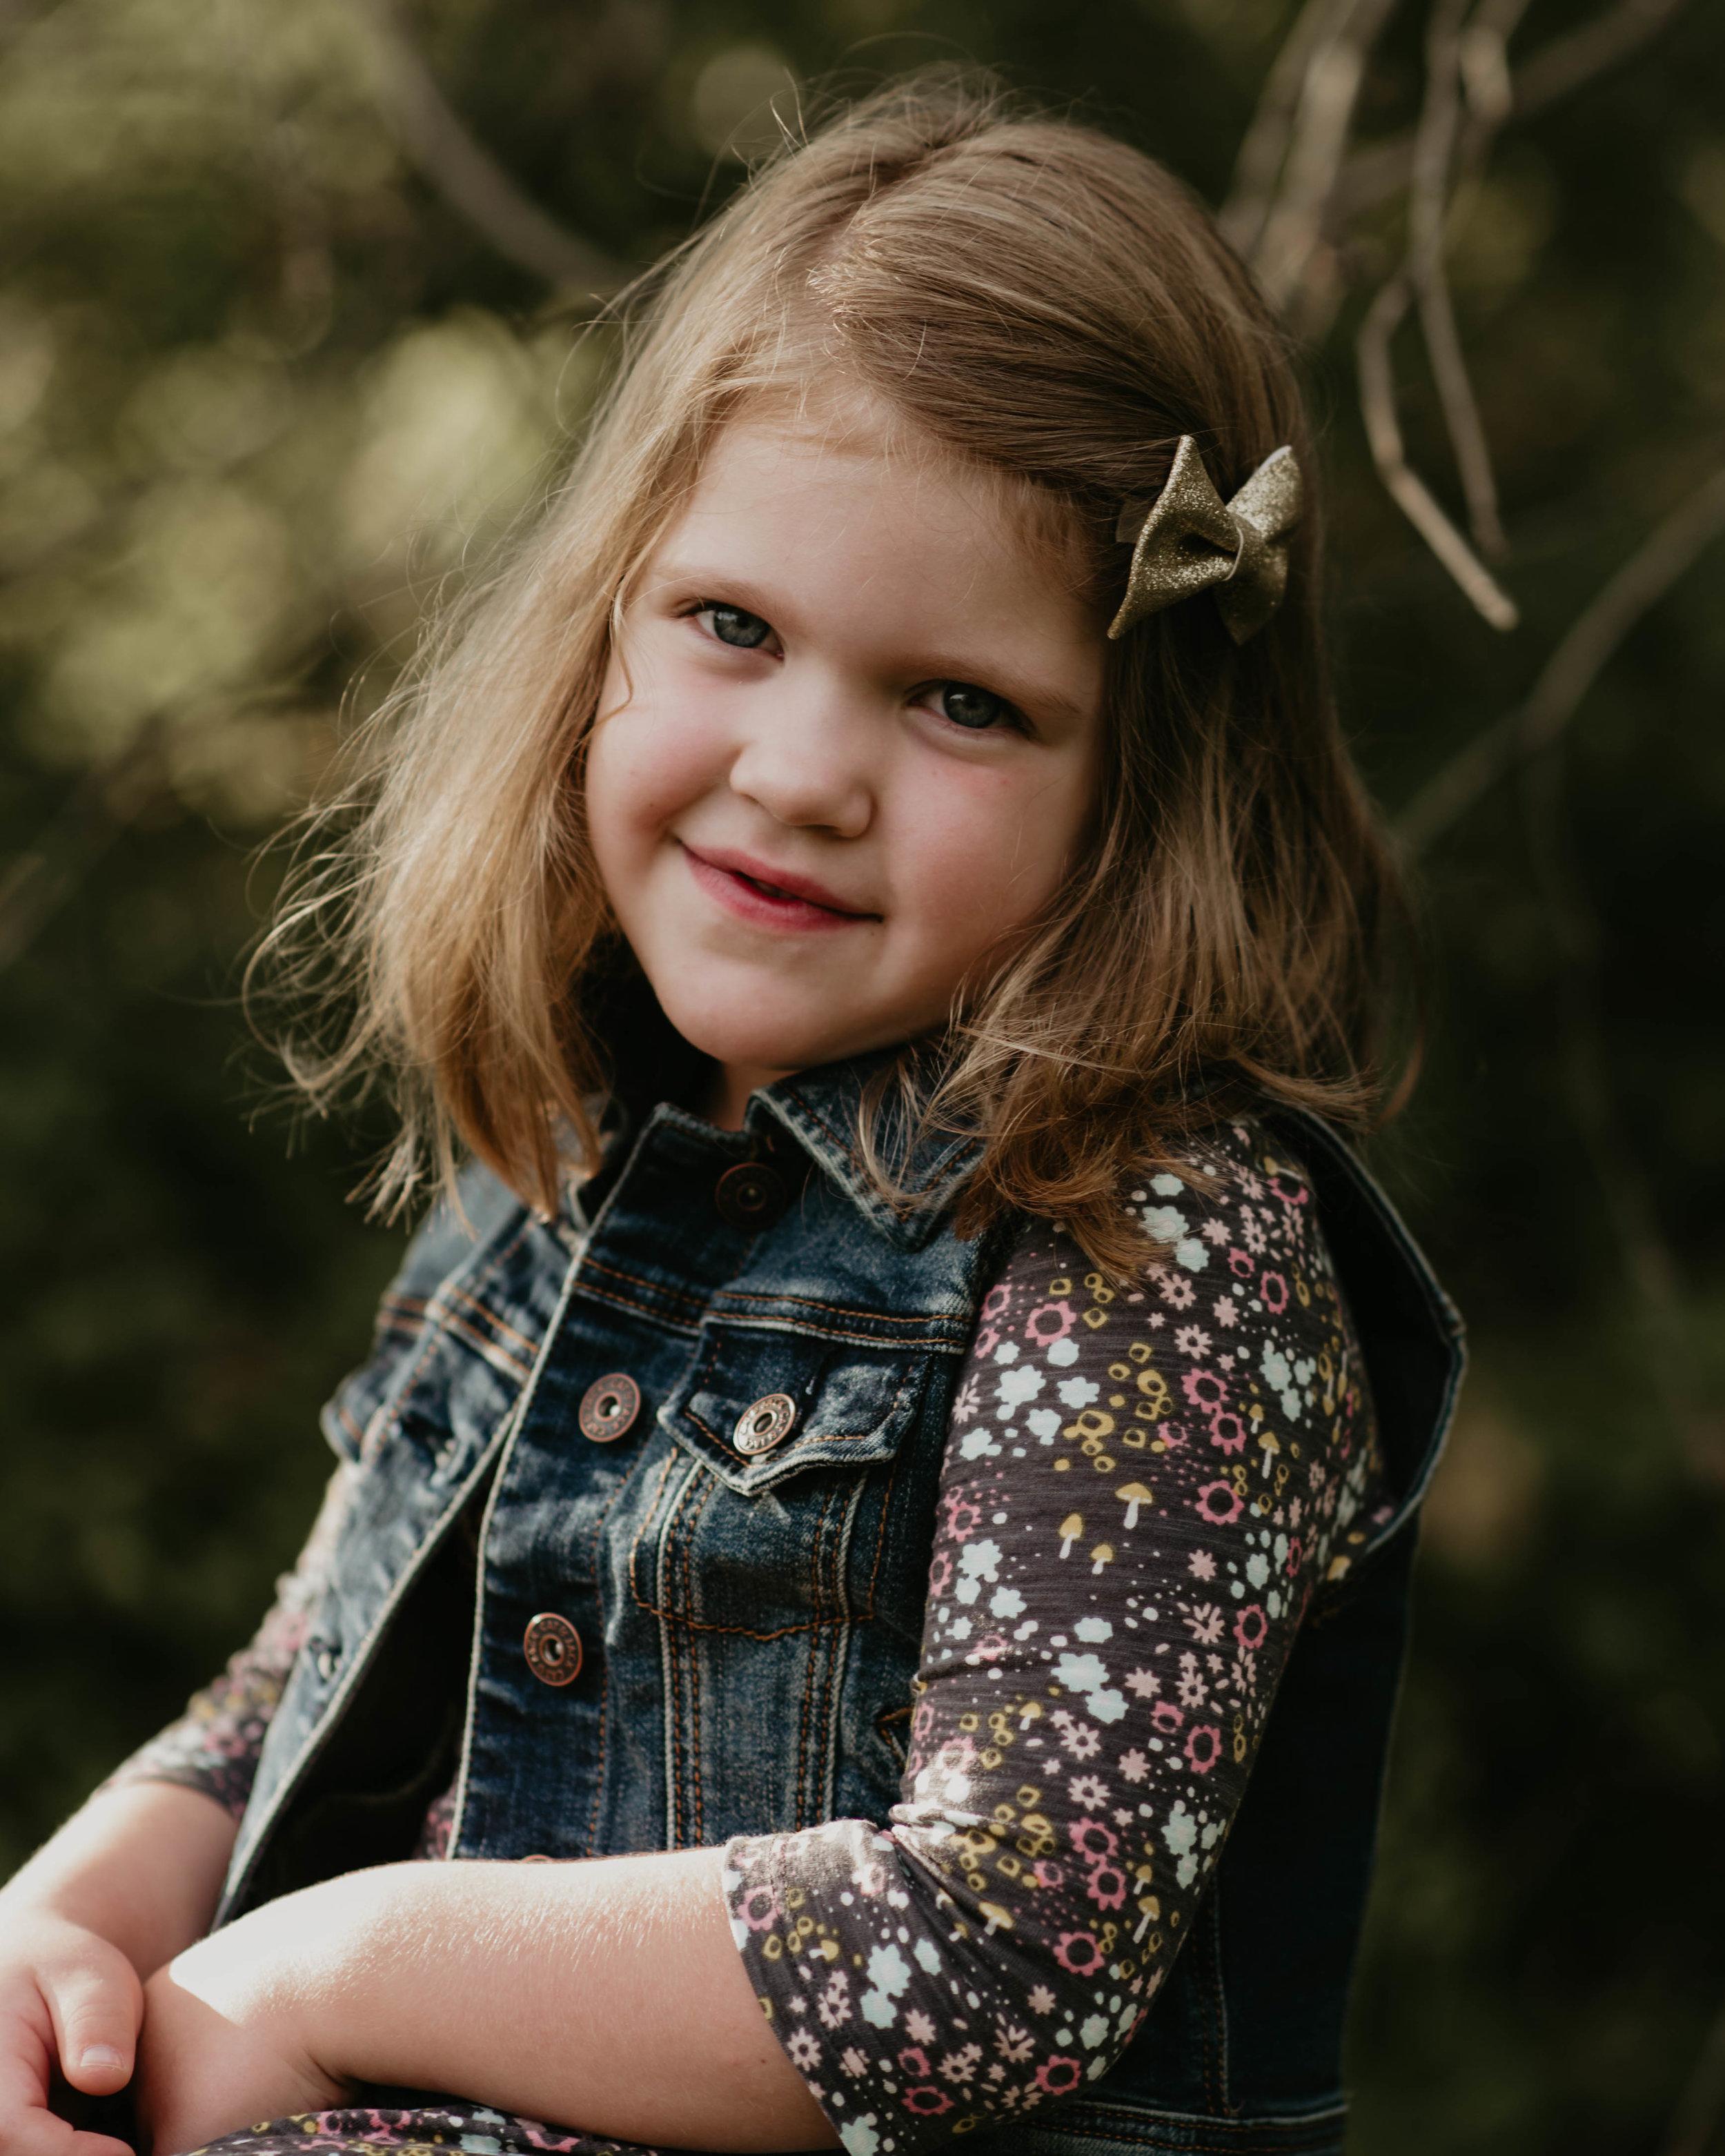 sparrows-flight-photography-lancaster-pa-lifestyle-children-photographer-3.jpg